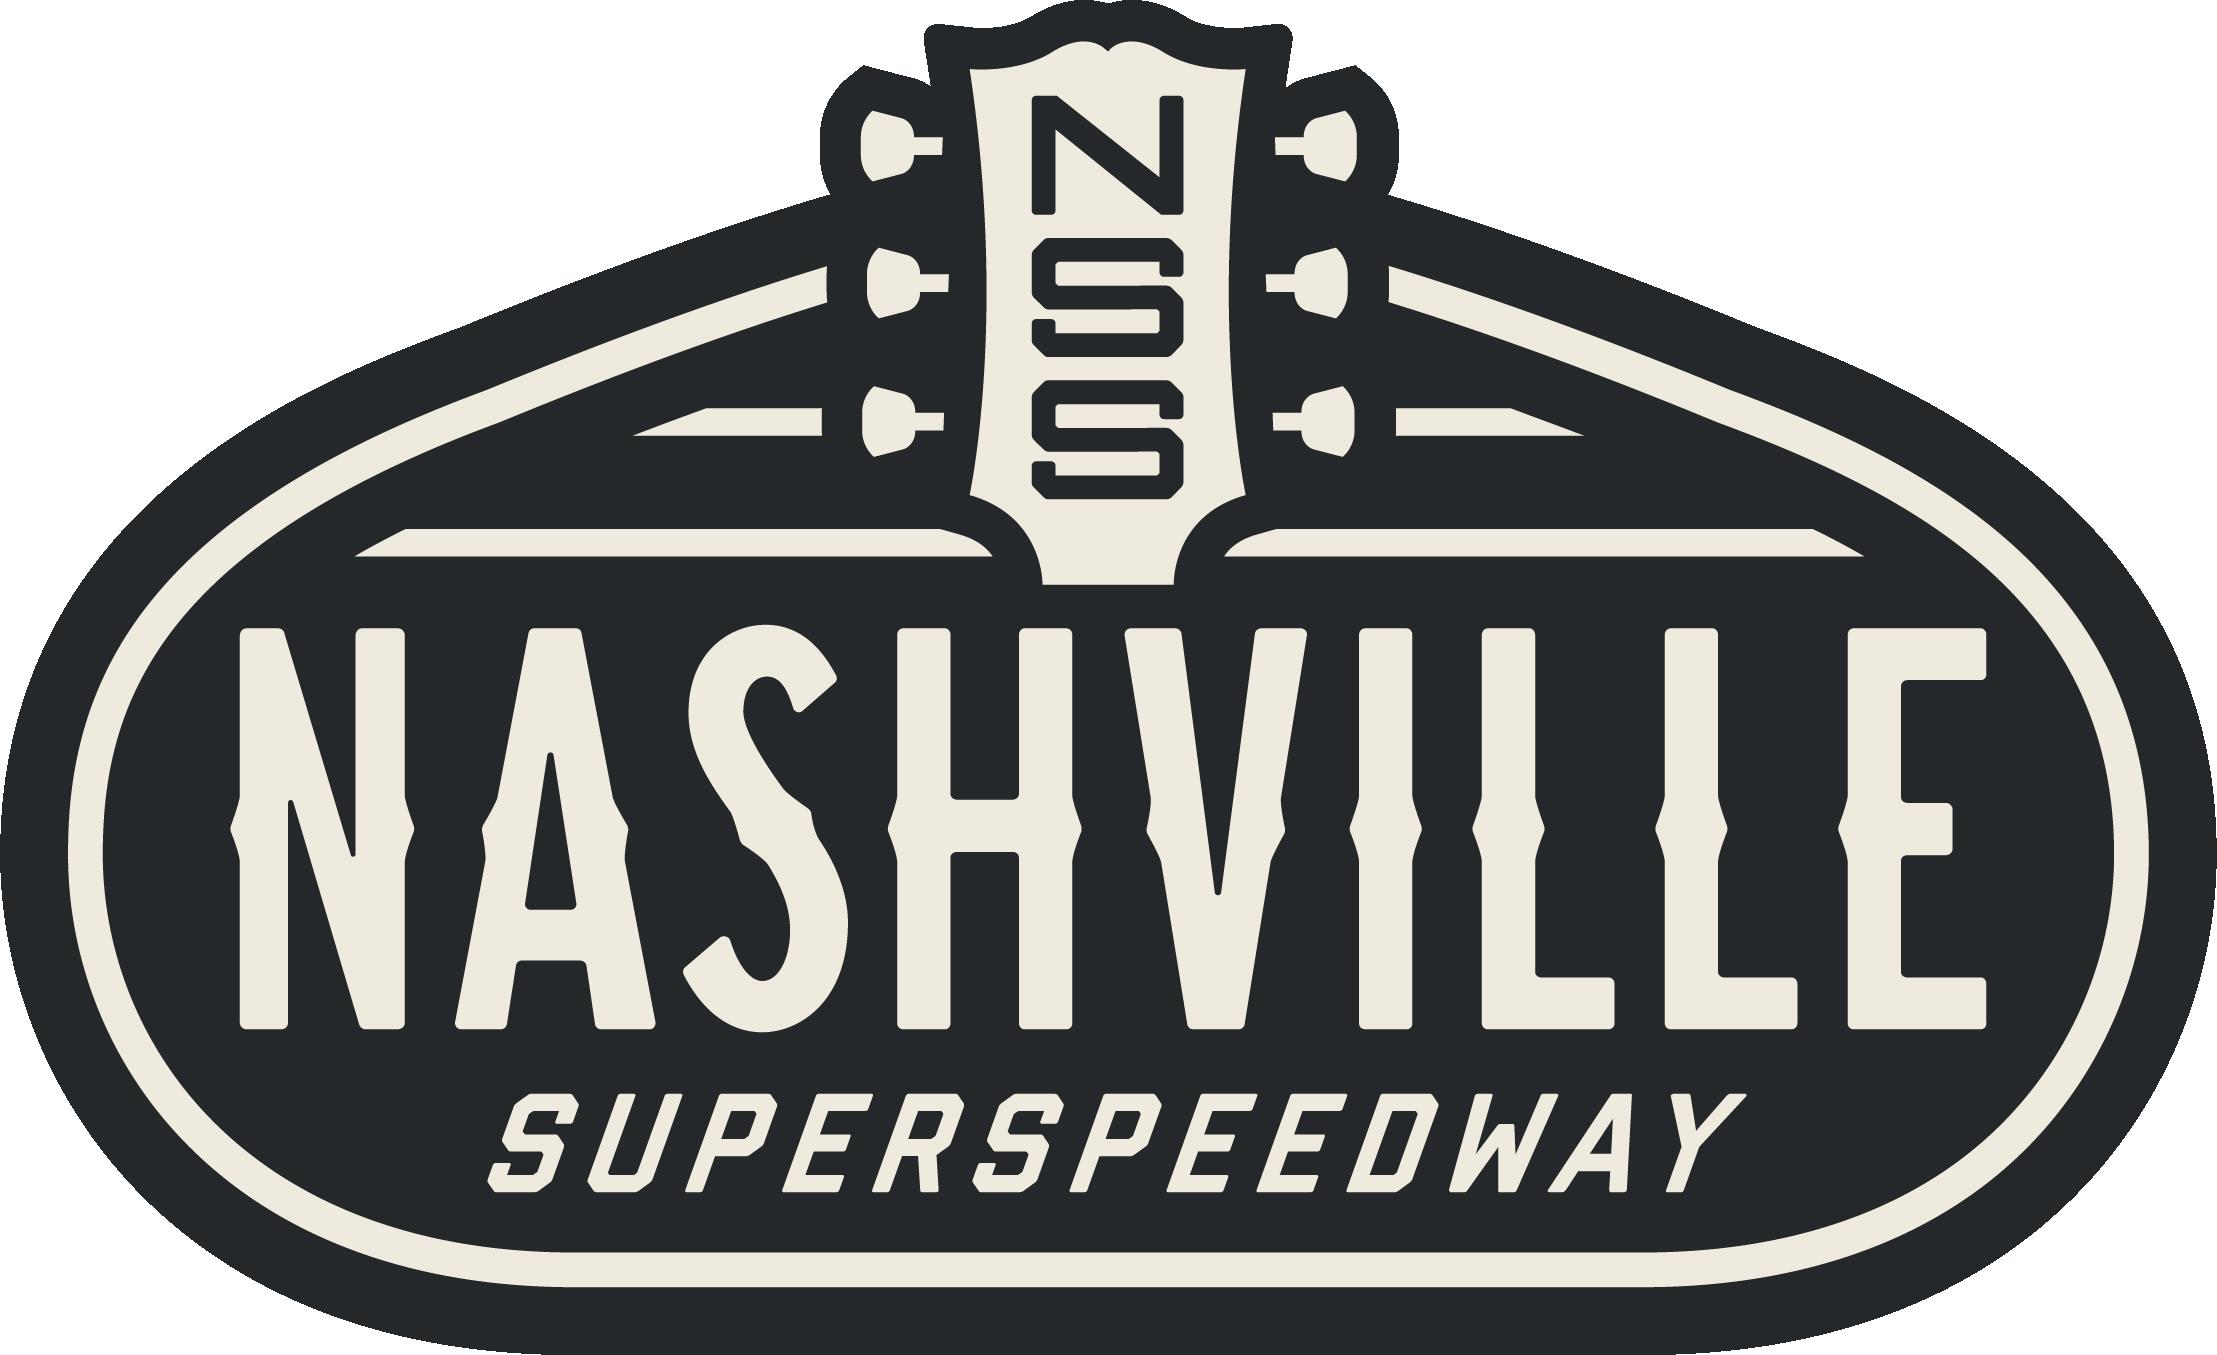 NASCAR Camping World Truck Series; Nashville Superspeedway